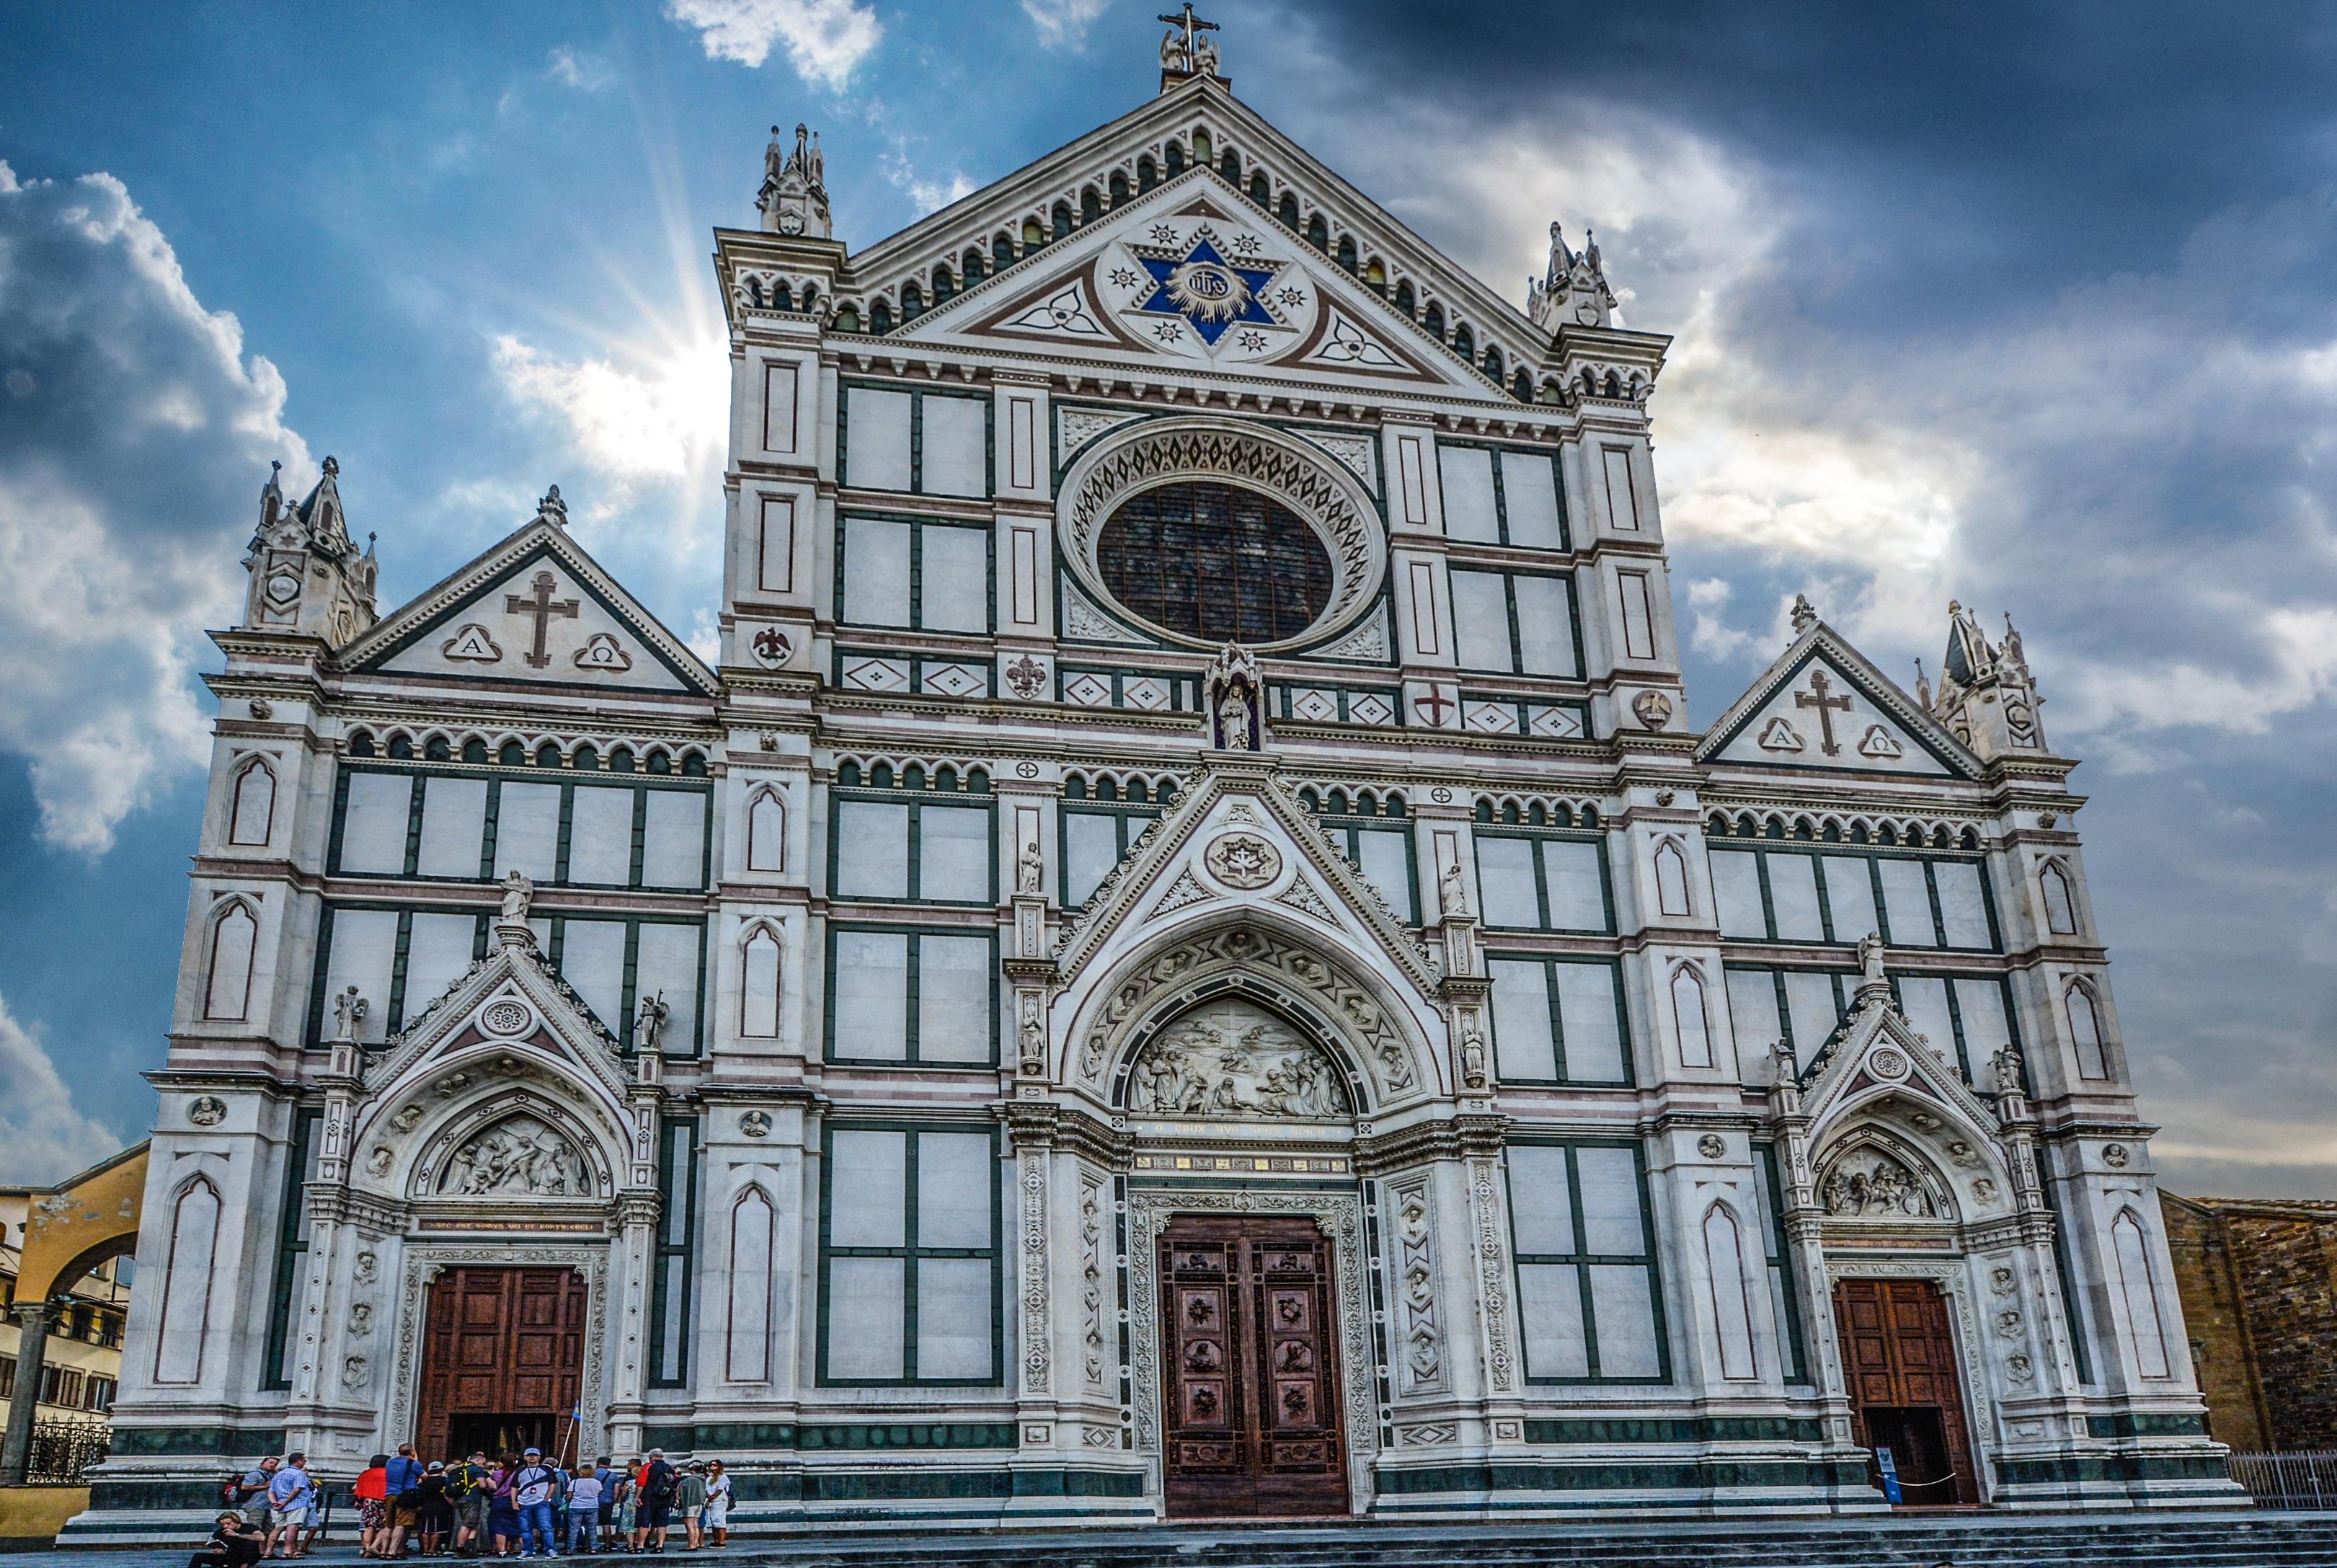 Italian Florence: Free Images : Building, Travel, Europe, Religion, Landmark